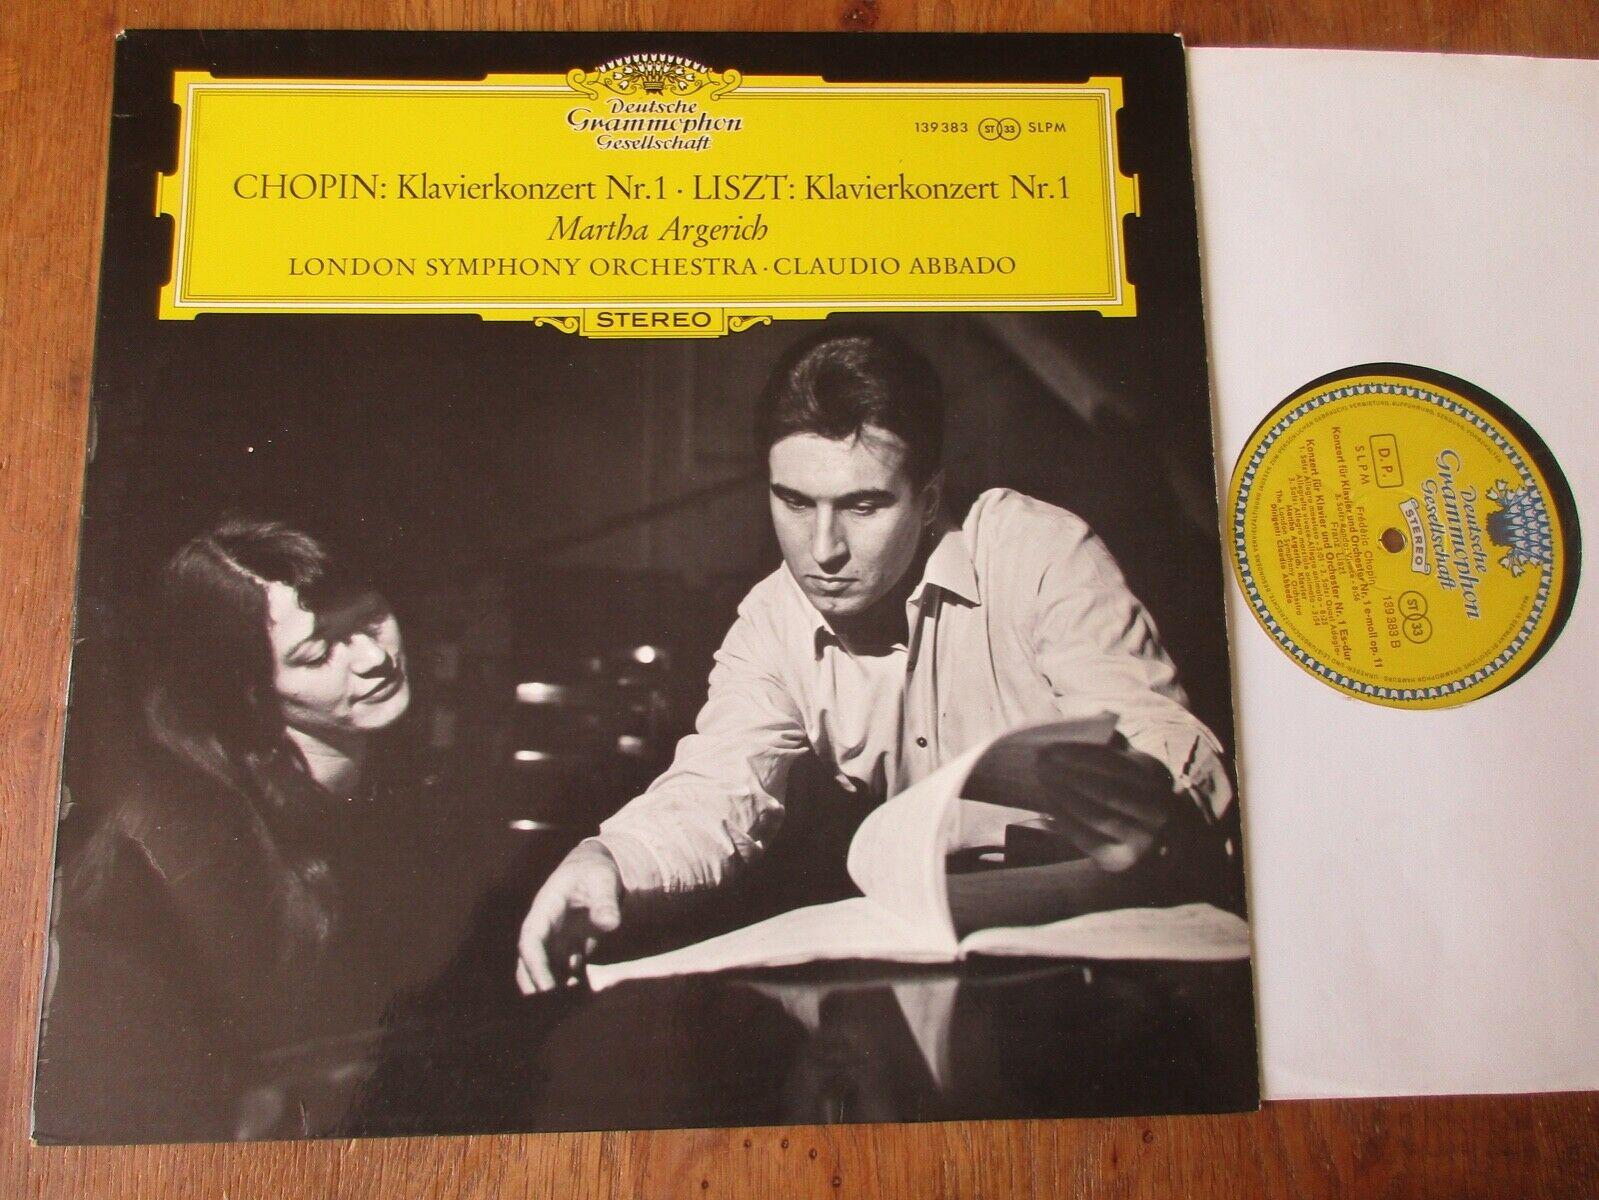 Chopin etc - Piano Concs / Argerich / Abbado / DGG 139 383 Stereo Ed1 Tulips NM